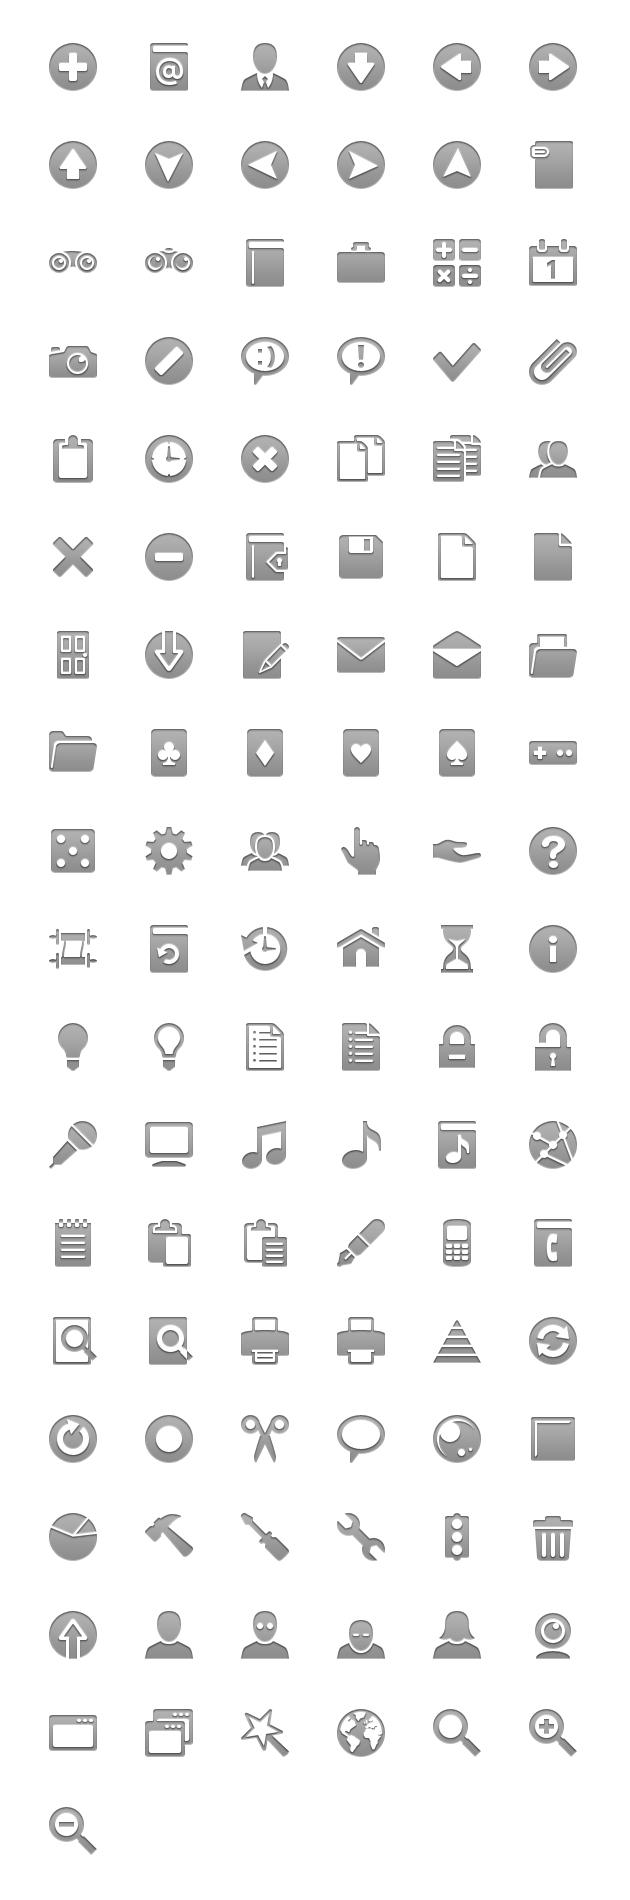 android icons general menu hdpi